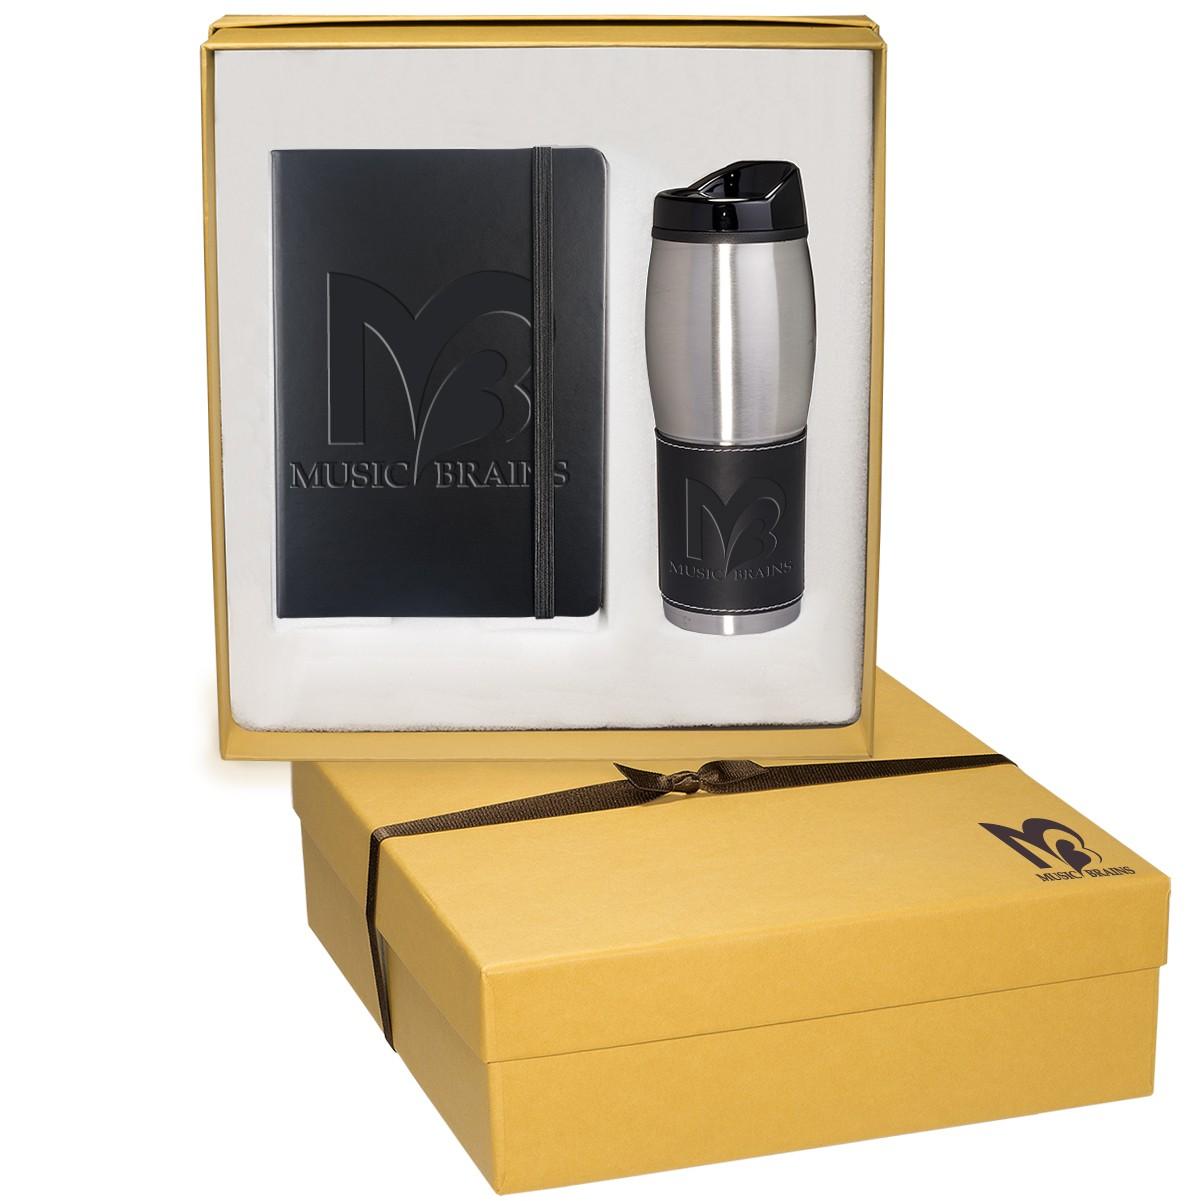 Tuscany™ Journal & Tumbler Gift Set